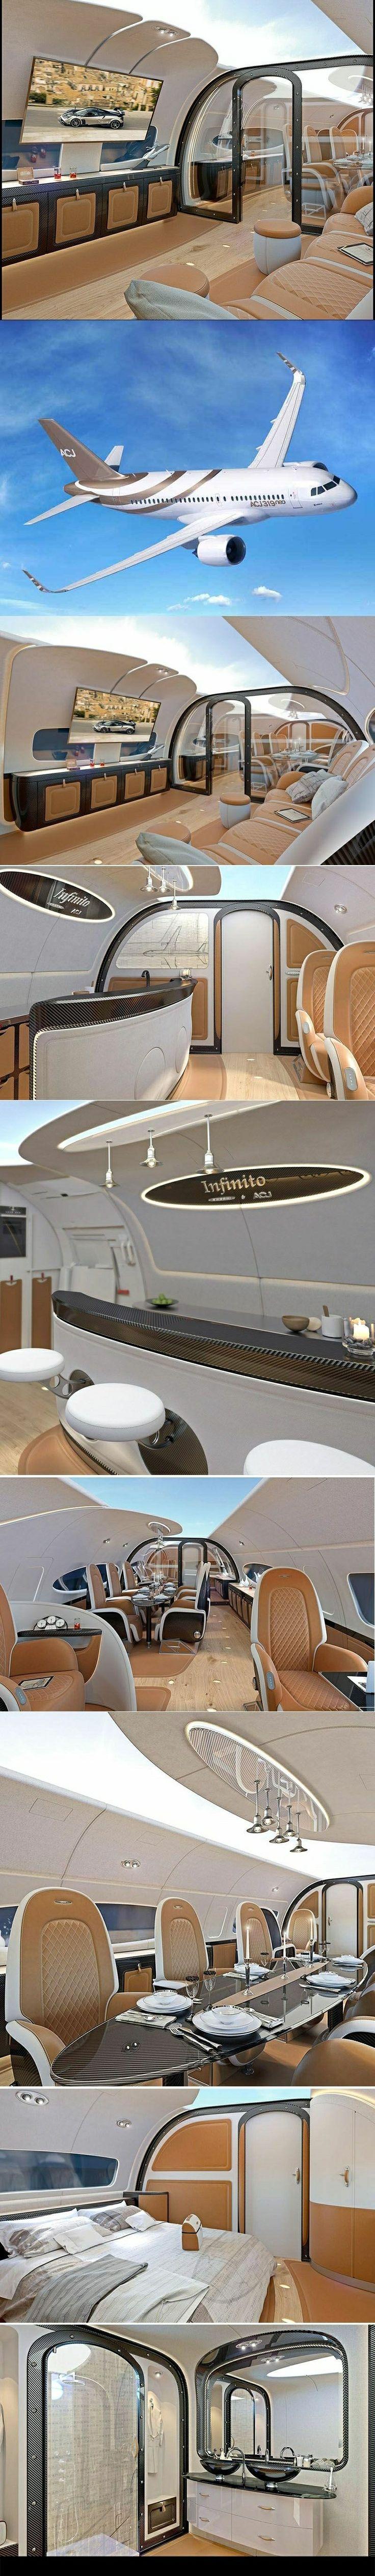 Airbus Business Jet